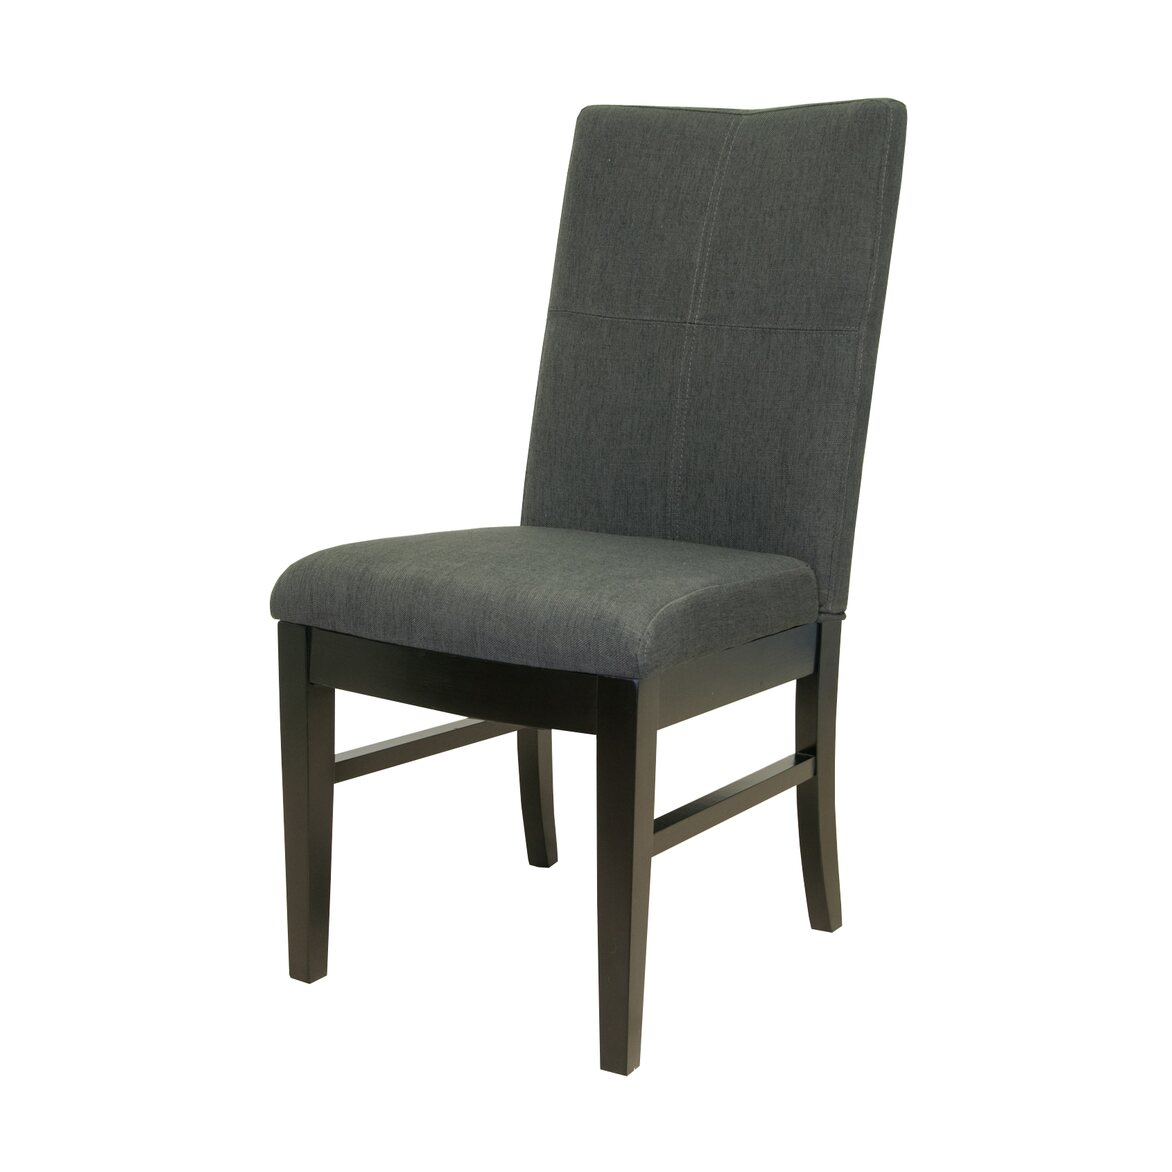 Стул Deng grey 4   Обеденные стулья Kingsby